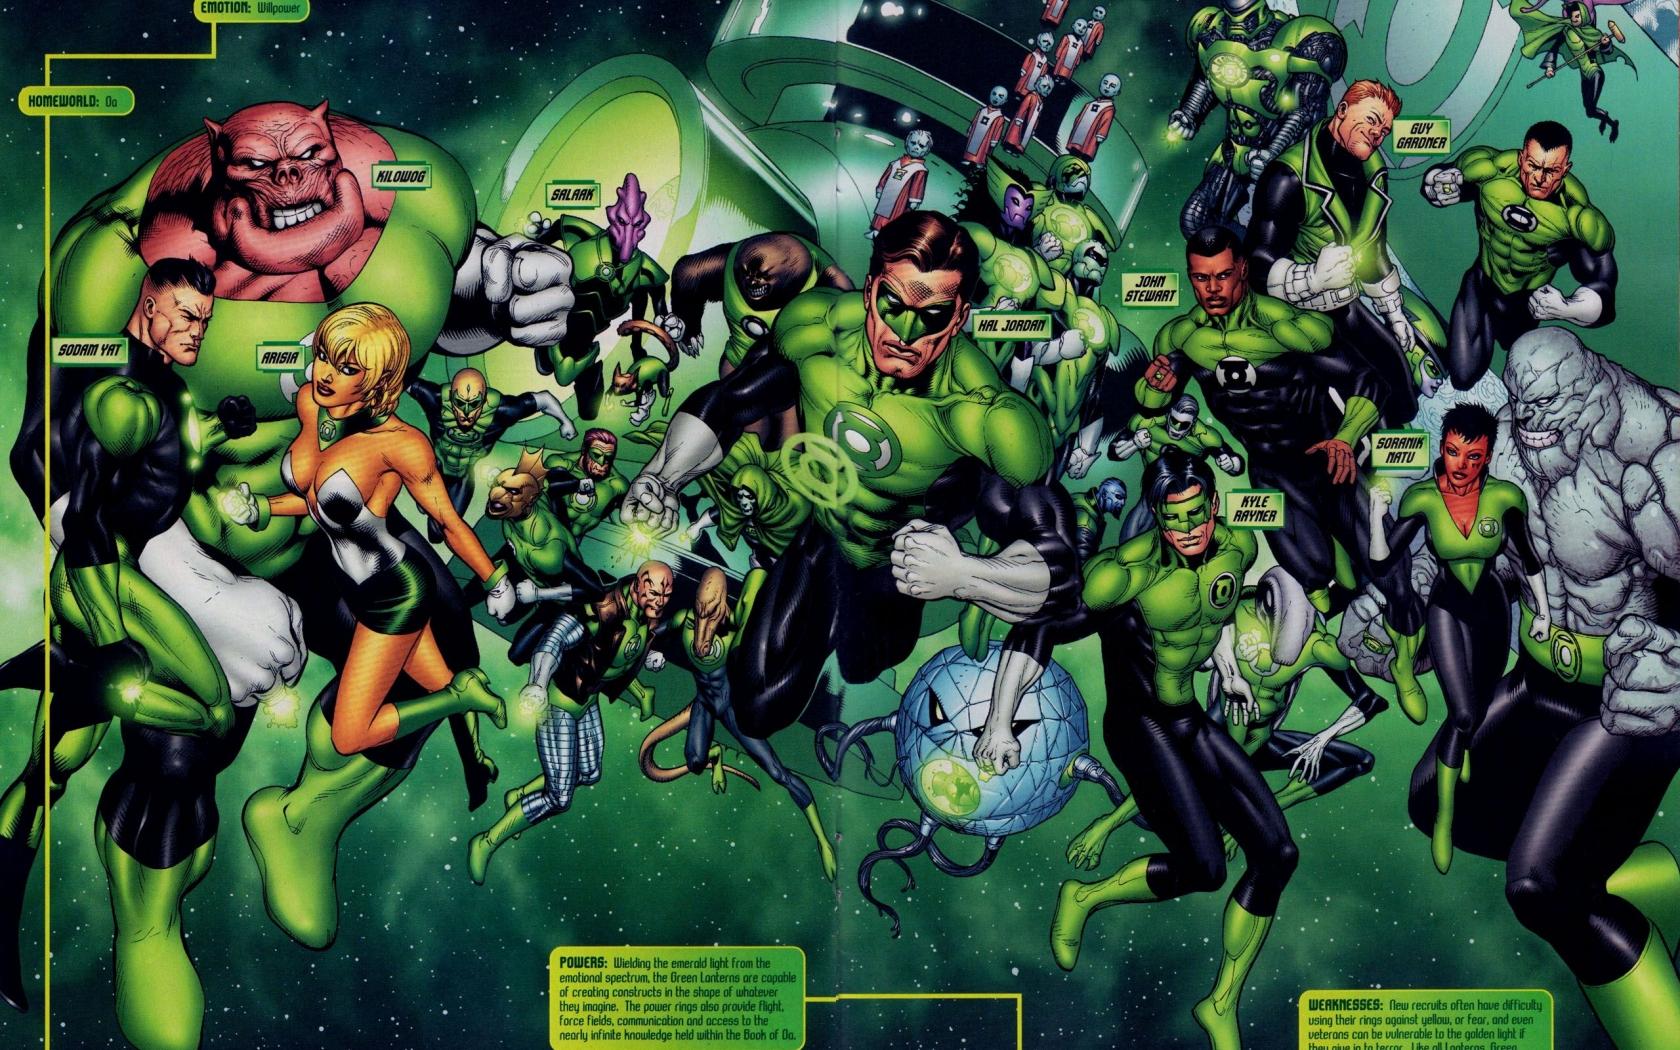 download Green Lantern Corps Wallpapers Top Green Lantern 1680x1050